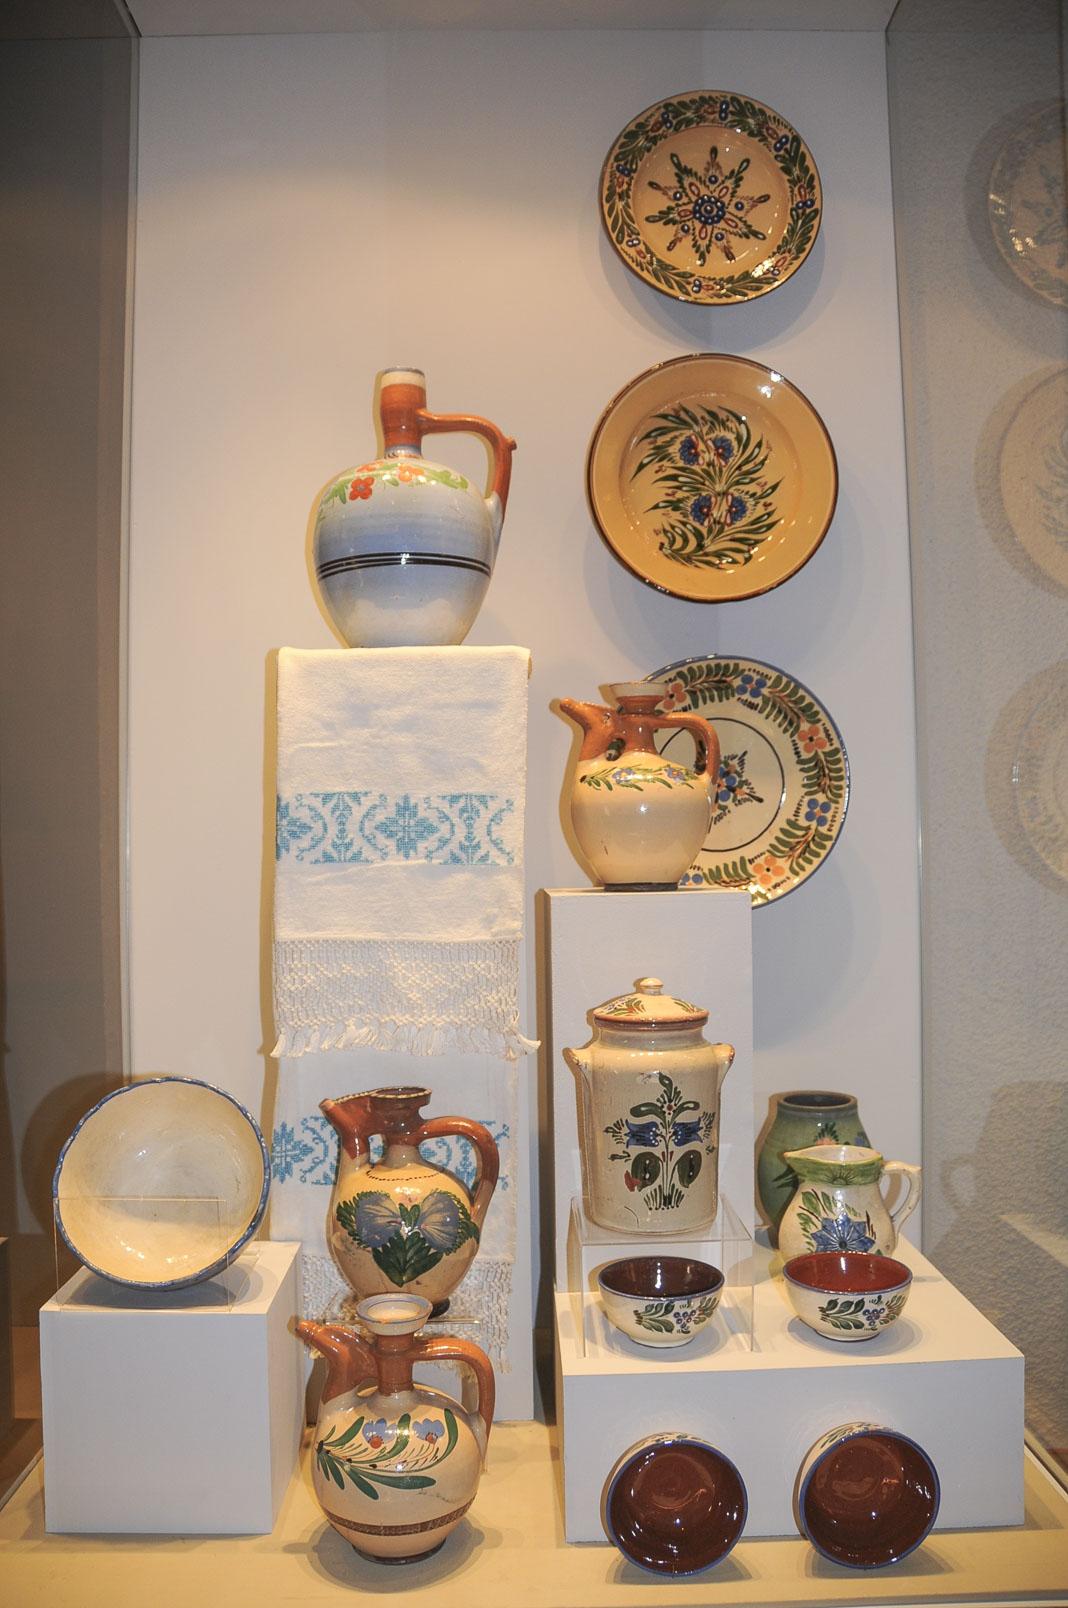 troyan-museum-cvetqta-na-zografa-1